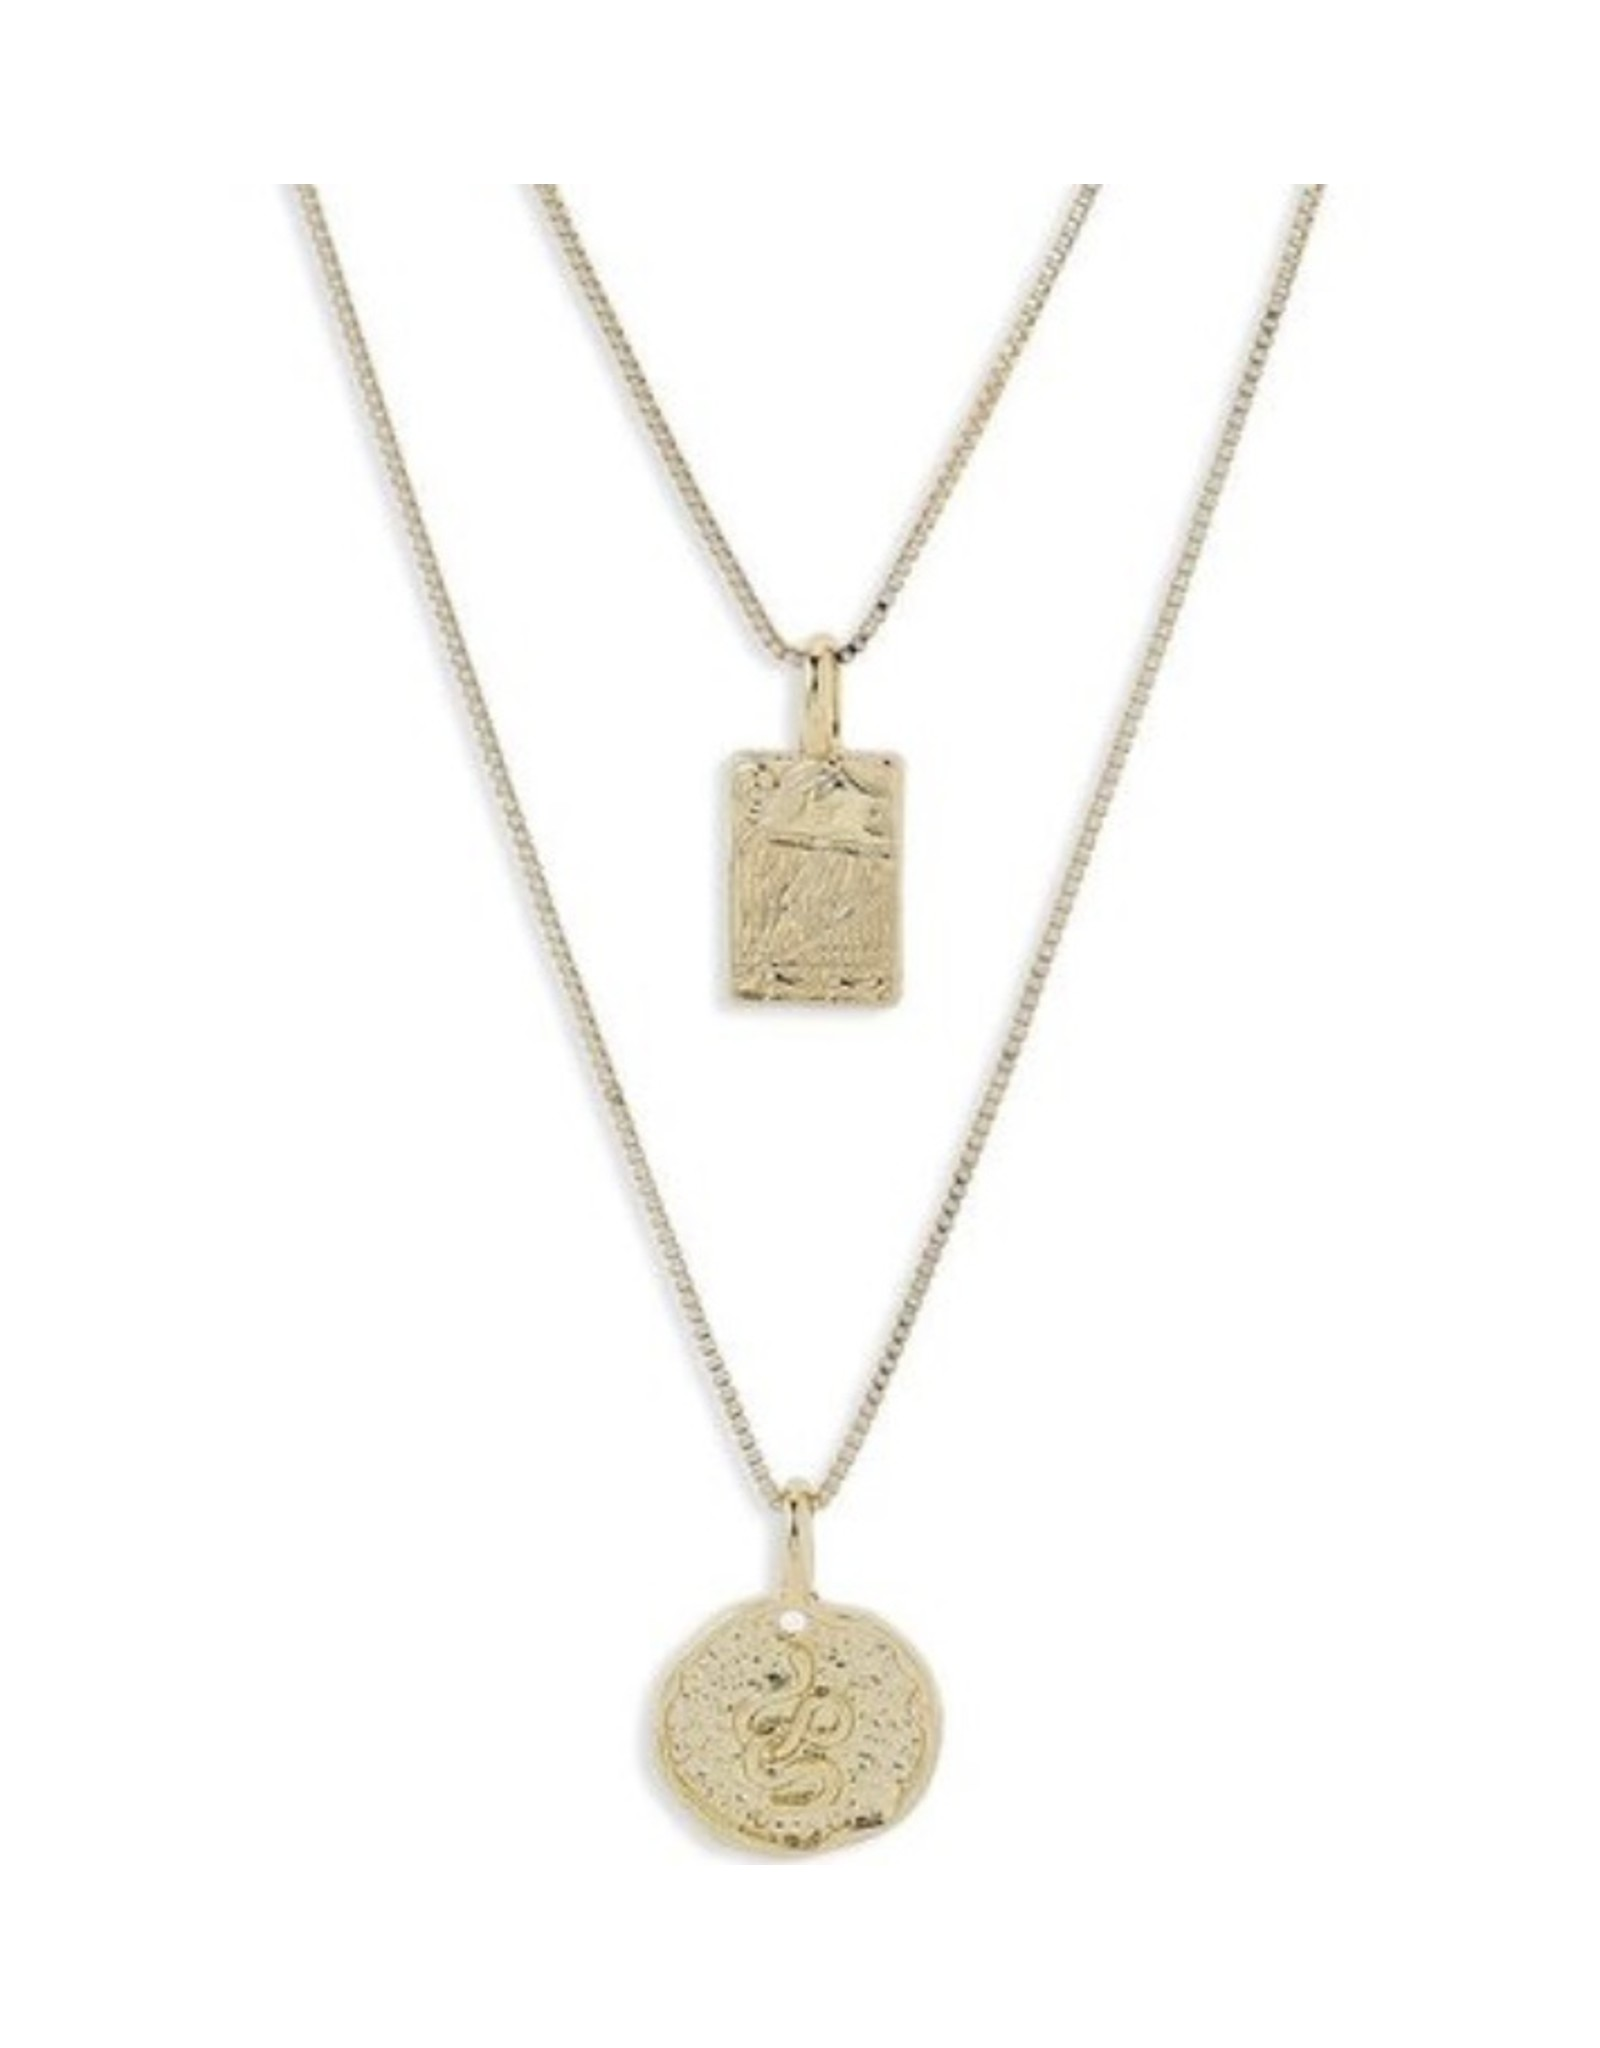 Pilgrim Necklace Valkyrai PI, Gold Plated